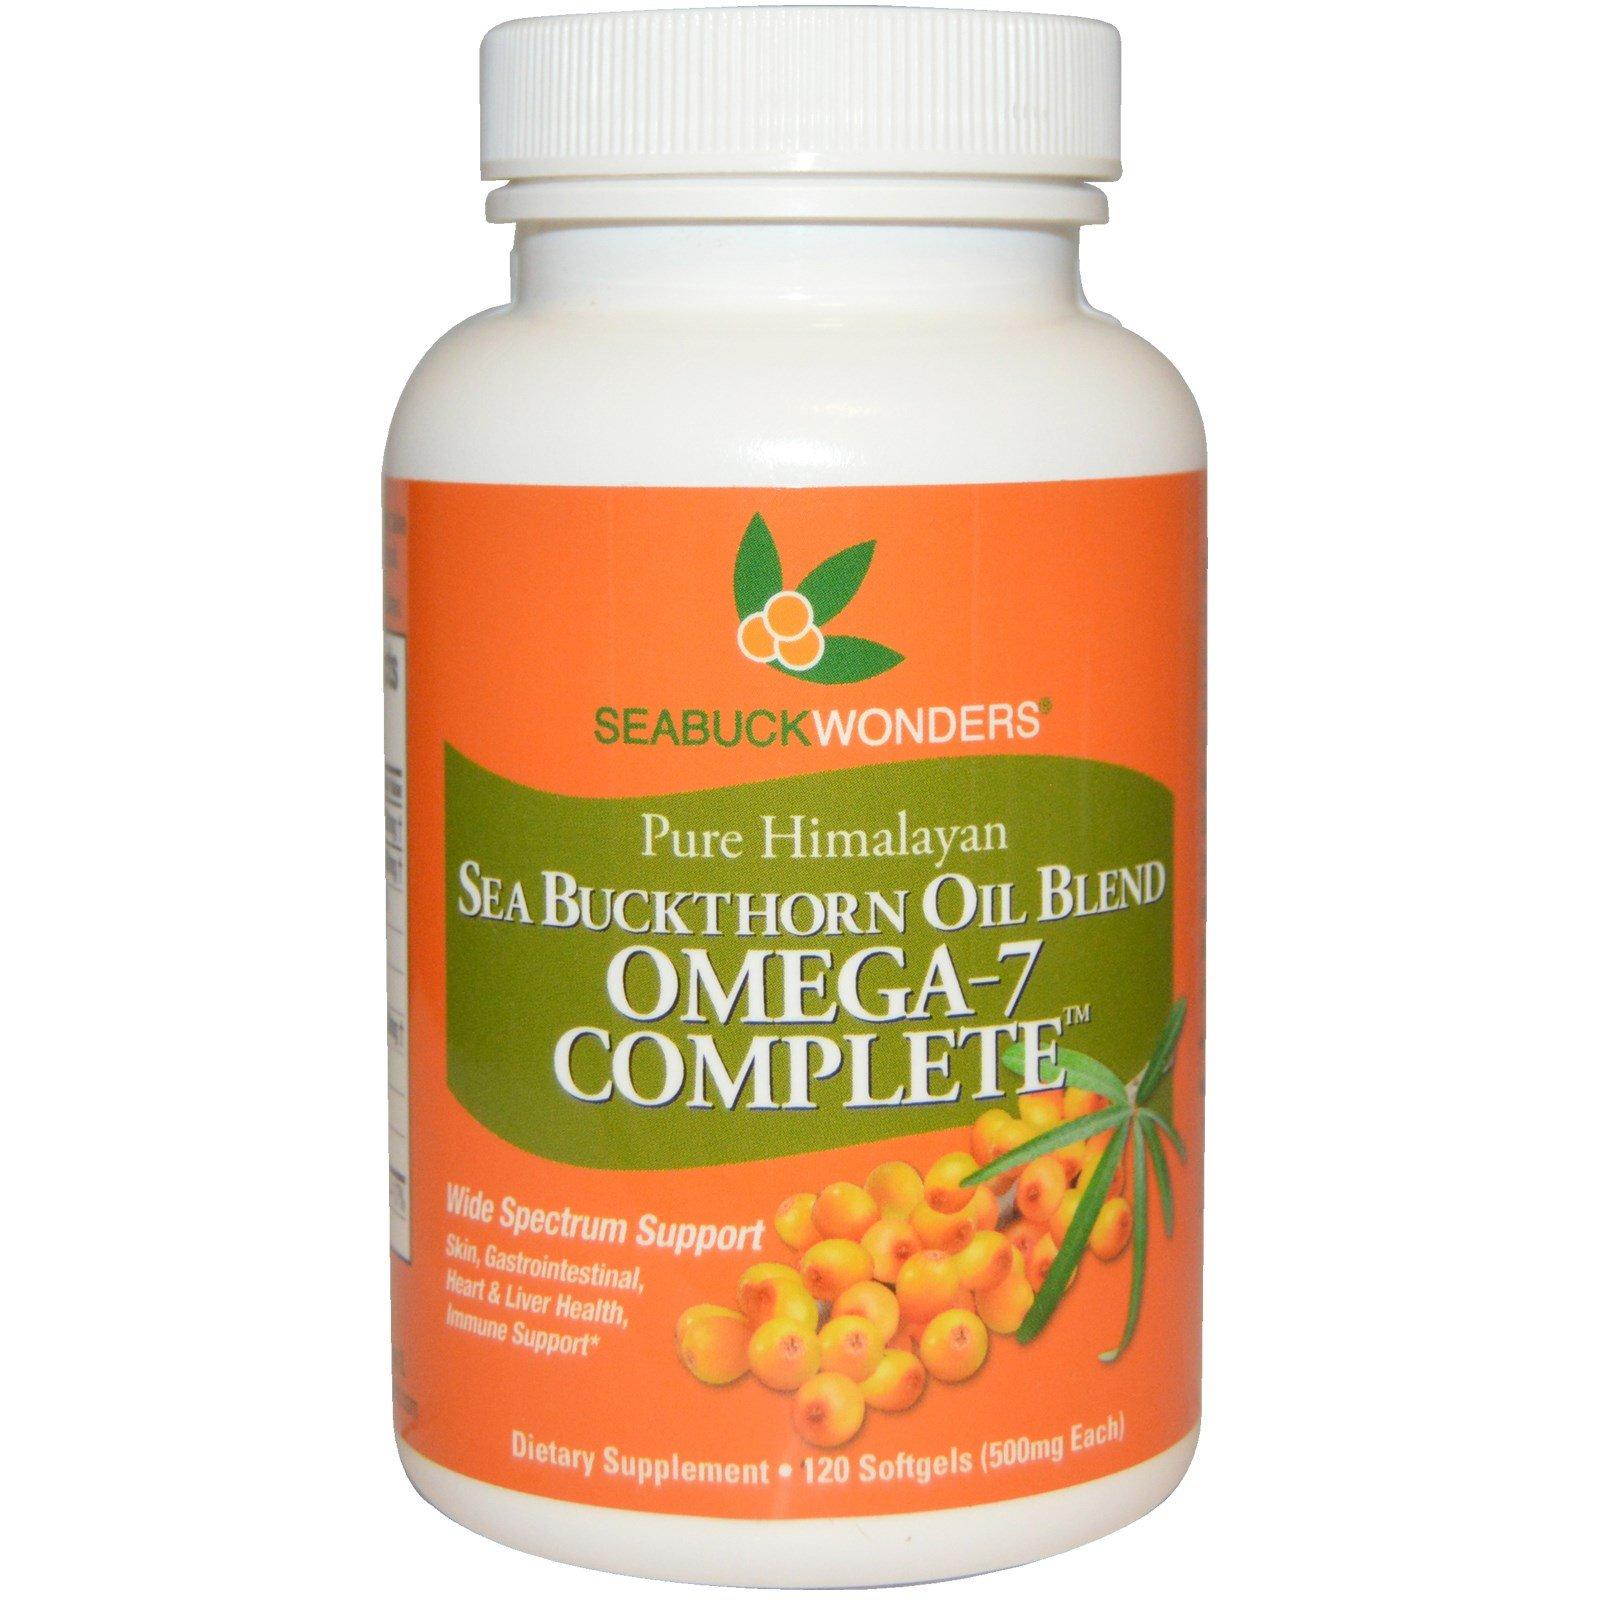 SeaBuckWonders, Sea Buckthorn Oil Blend, Omega-7 Complete, 500 mg, 120 Softgels - 3PC